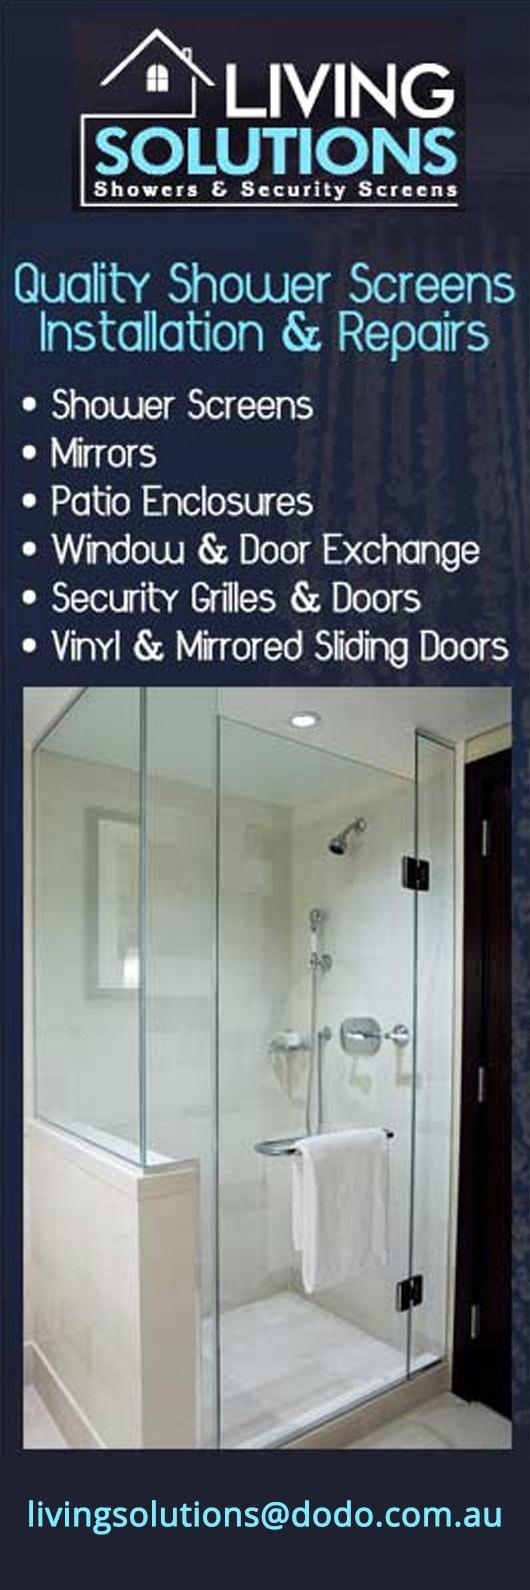 Living Solutions Shower & Security Screens - Security Doors, Windows ...